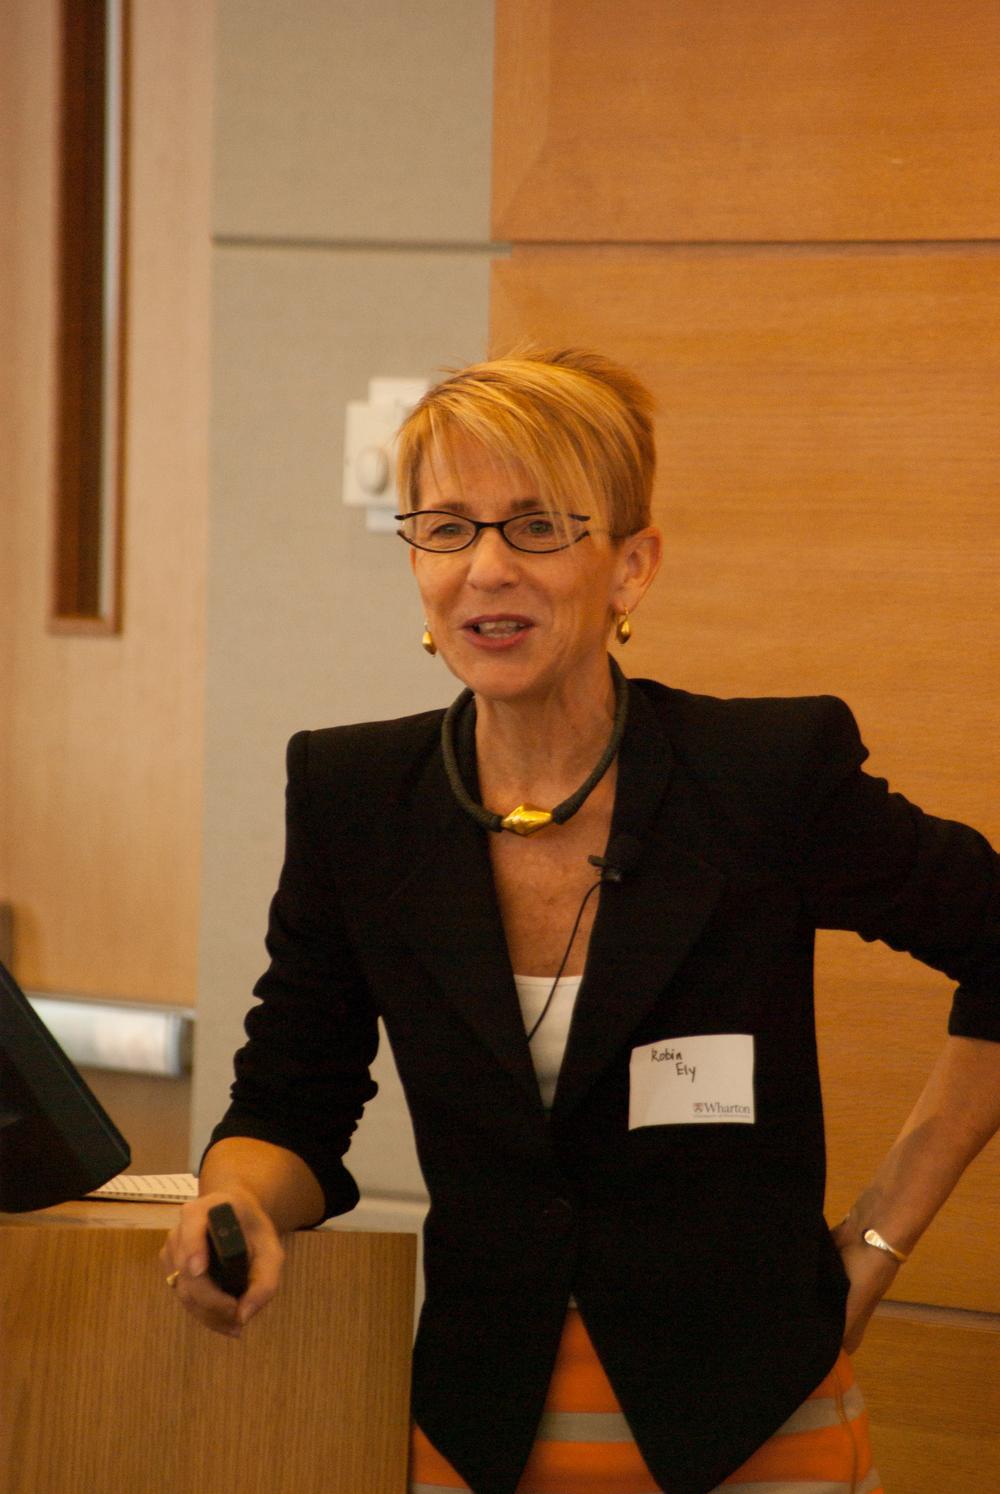 KEYNOTE SPEAKER:pROFESSOR ROBIN ELY, hARVARD BUSINESS SCHOOL (ORGANIZATIONAL BEHAVIOR)